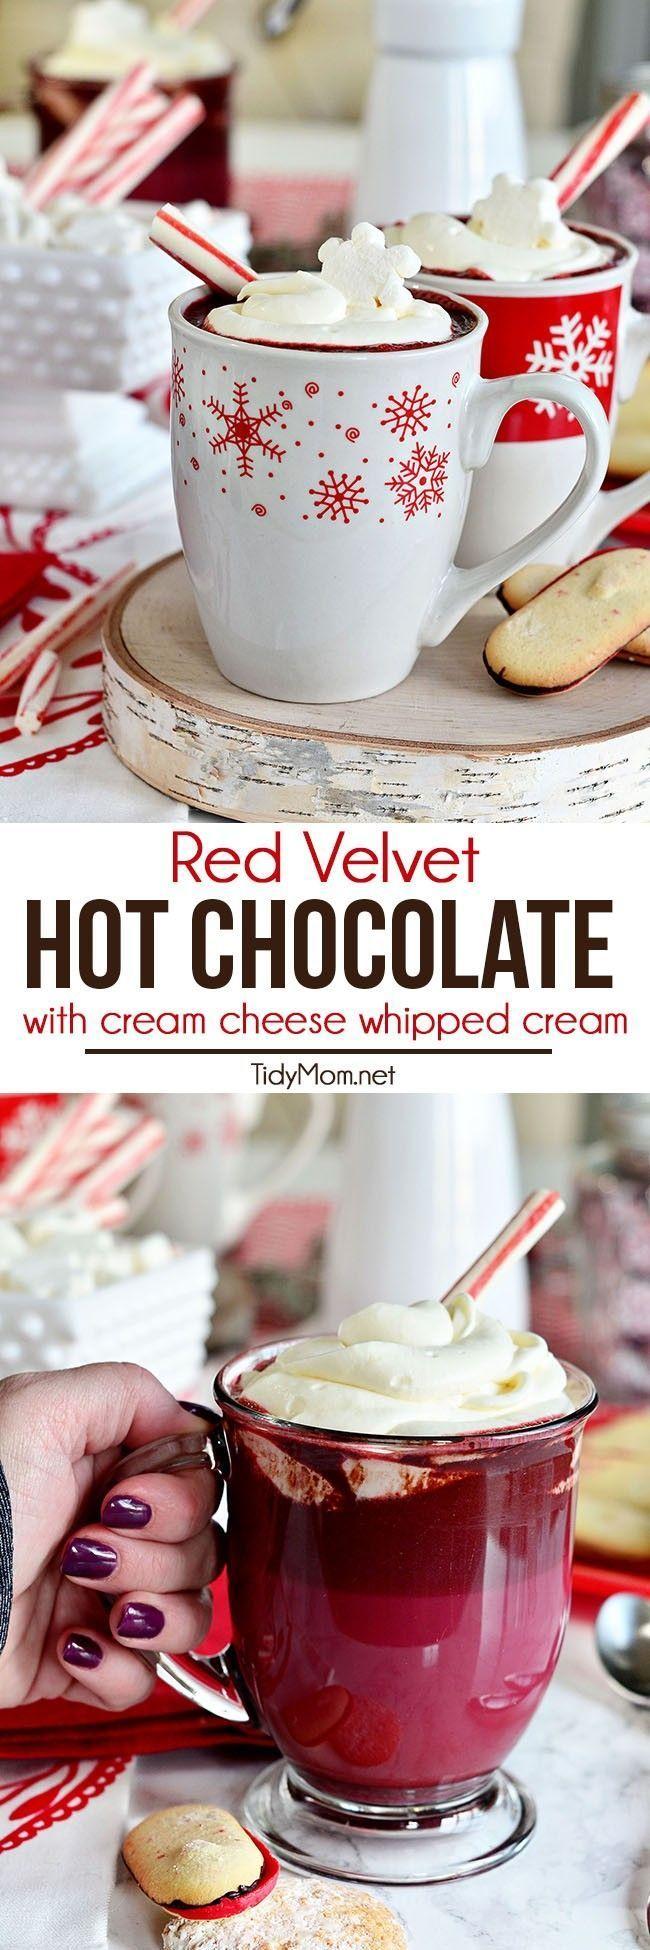 Red Velvet Hot Chocolate with Cream Cheese Whipped Cream